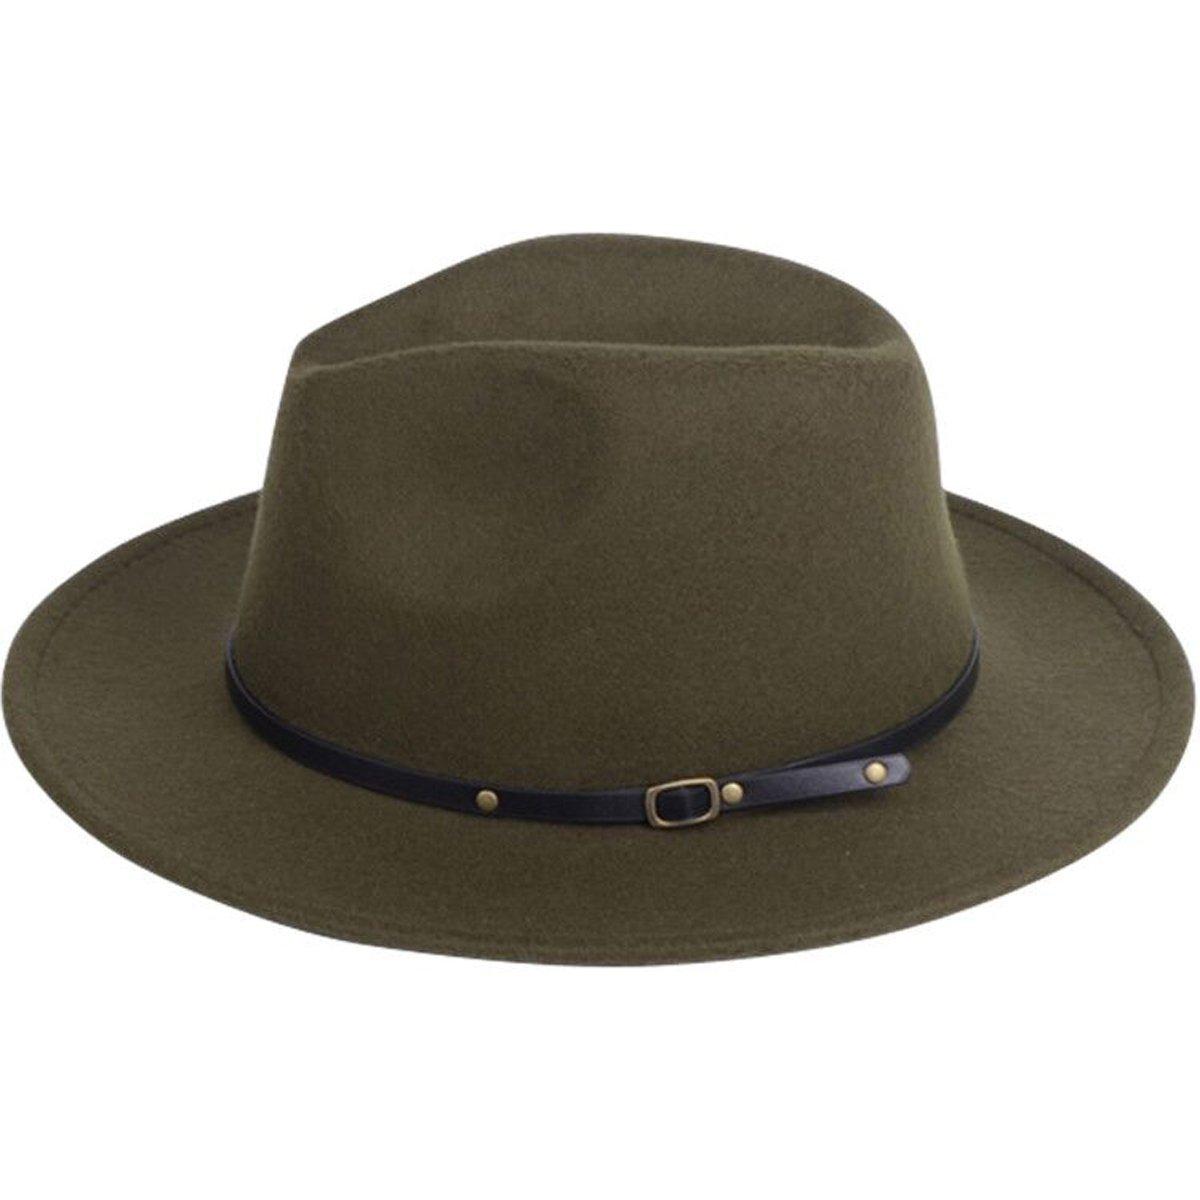 7748d34a72c Lanzom Womens Classic Wide Brim Floppy Panama Hat Belt Buckle Wool Fedora  Hat Black ) woolhat91